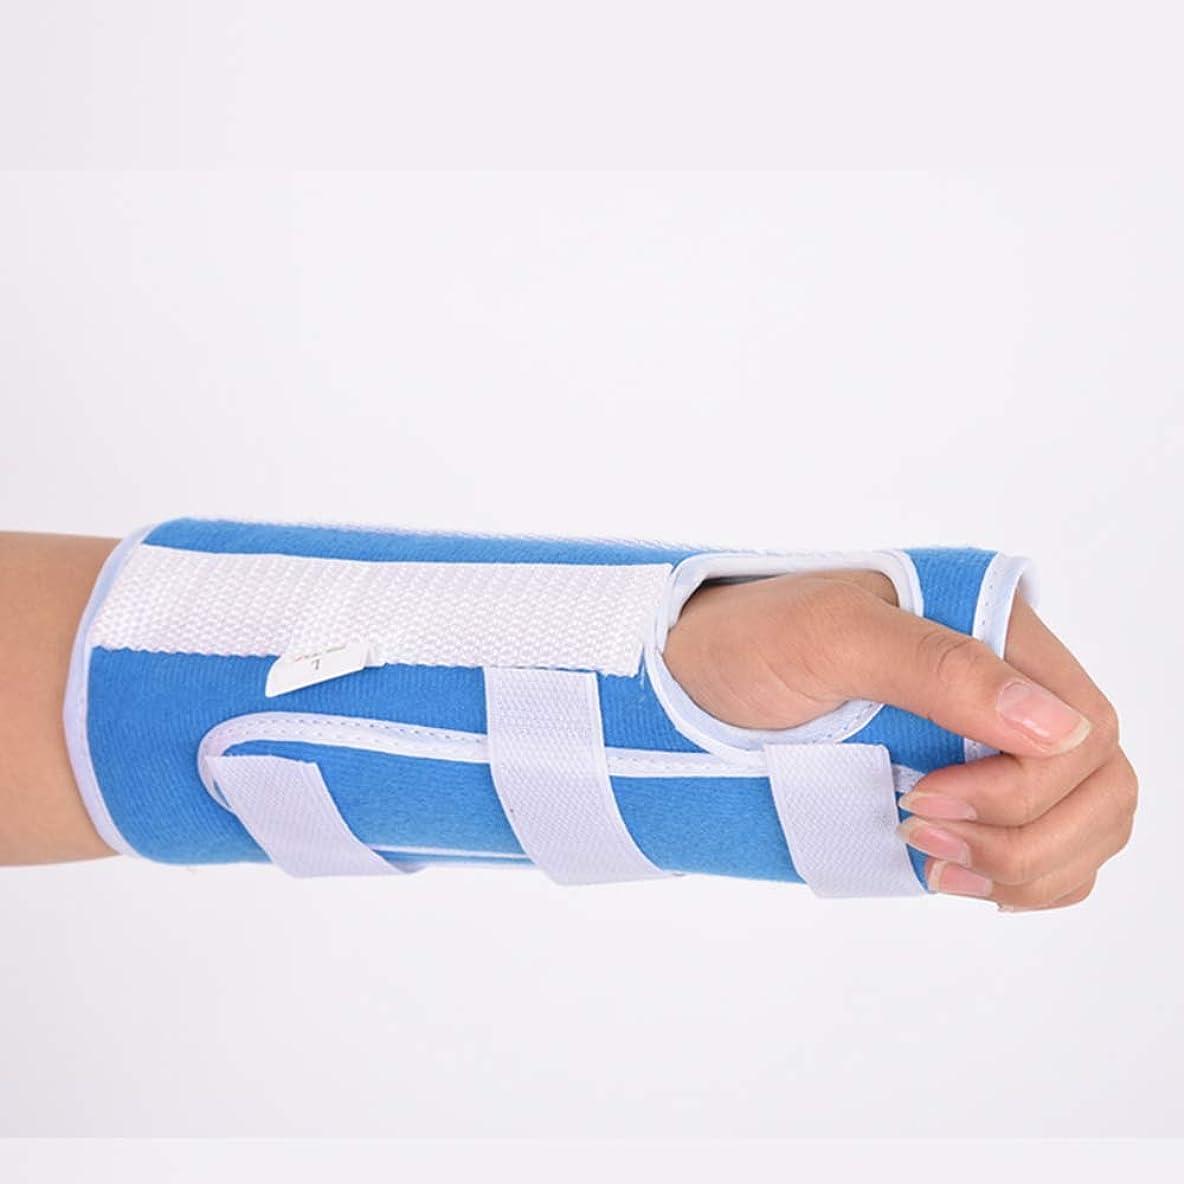 洋服修道院信条手根管用手首装具、関節炎および腱炎用の快適で調整可能な手首支持装具、左手と右手の両方に適合,S